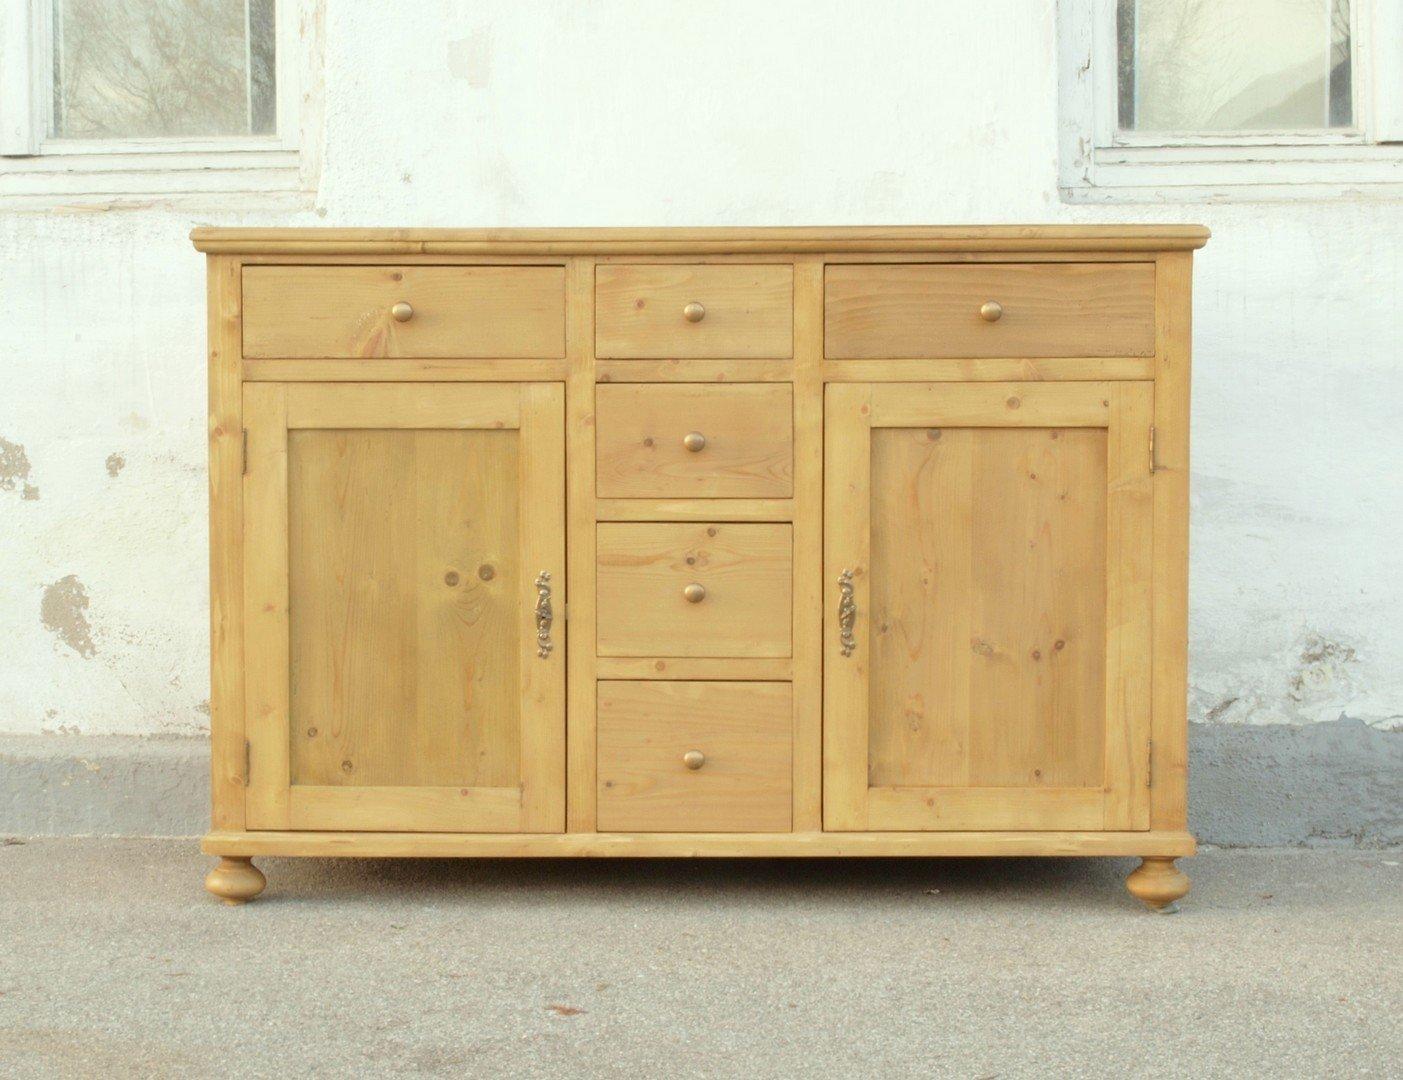 a140s anrichte kommode bauernkommode aus massivem weichholz. Black Bedroom Furniture Sets. Home Design Ideas